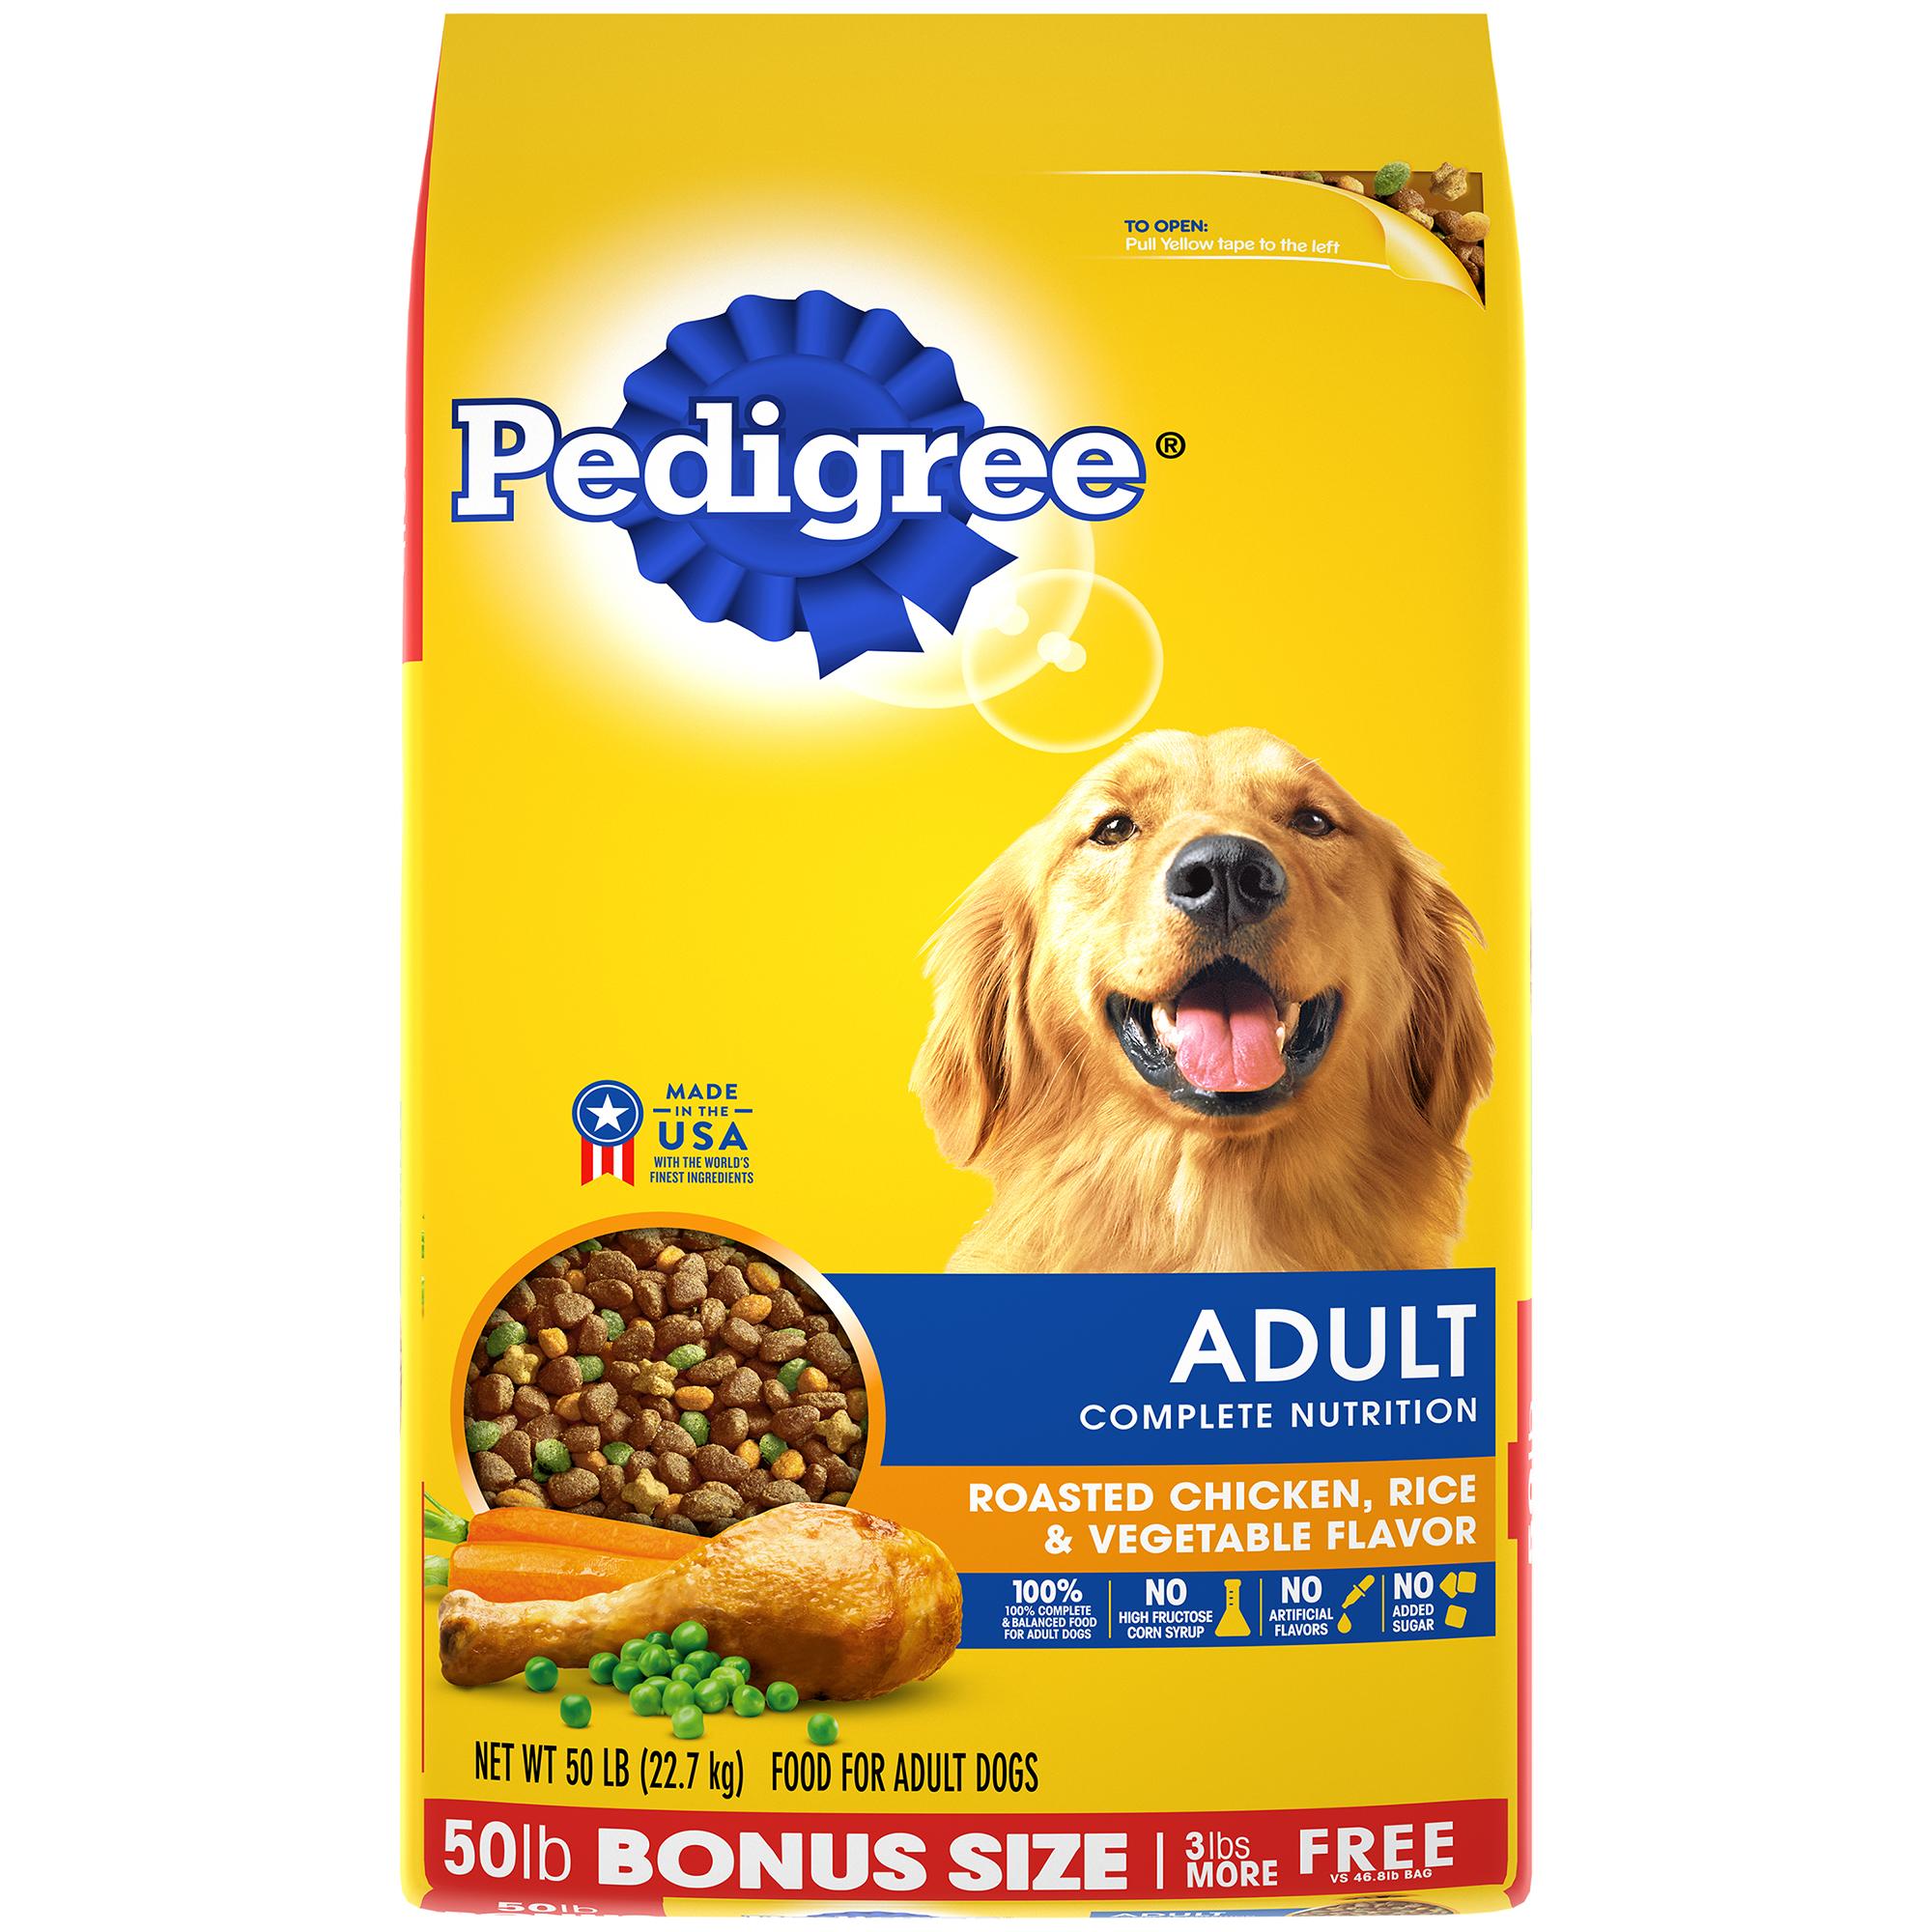 Pedigree Adult Complete Nutrition Roasted Chicken, Rice & Vegetable Flavor Dry Dog Food, 50-lb